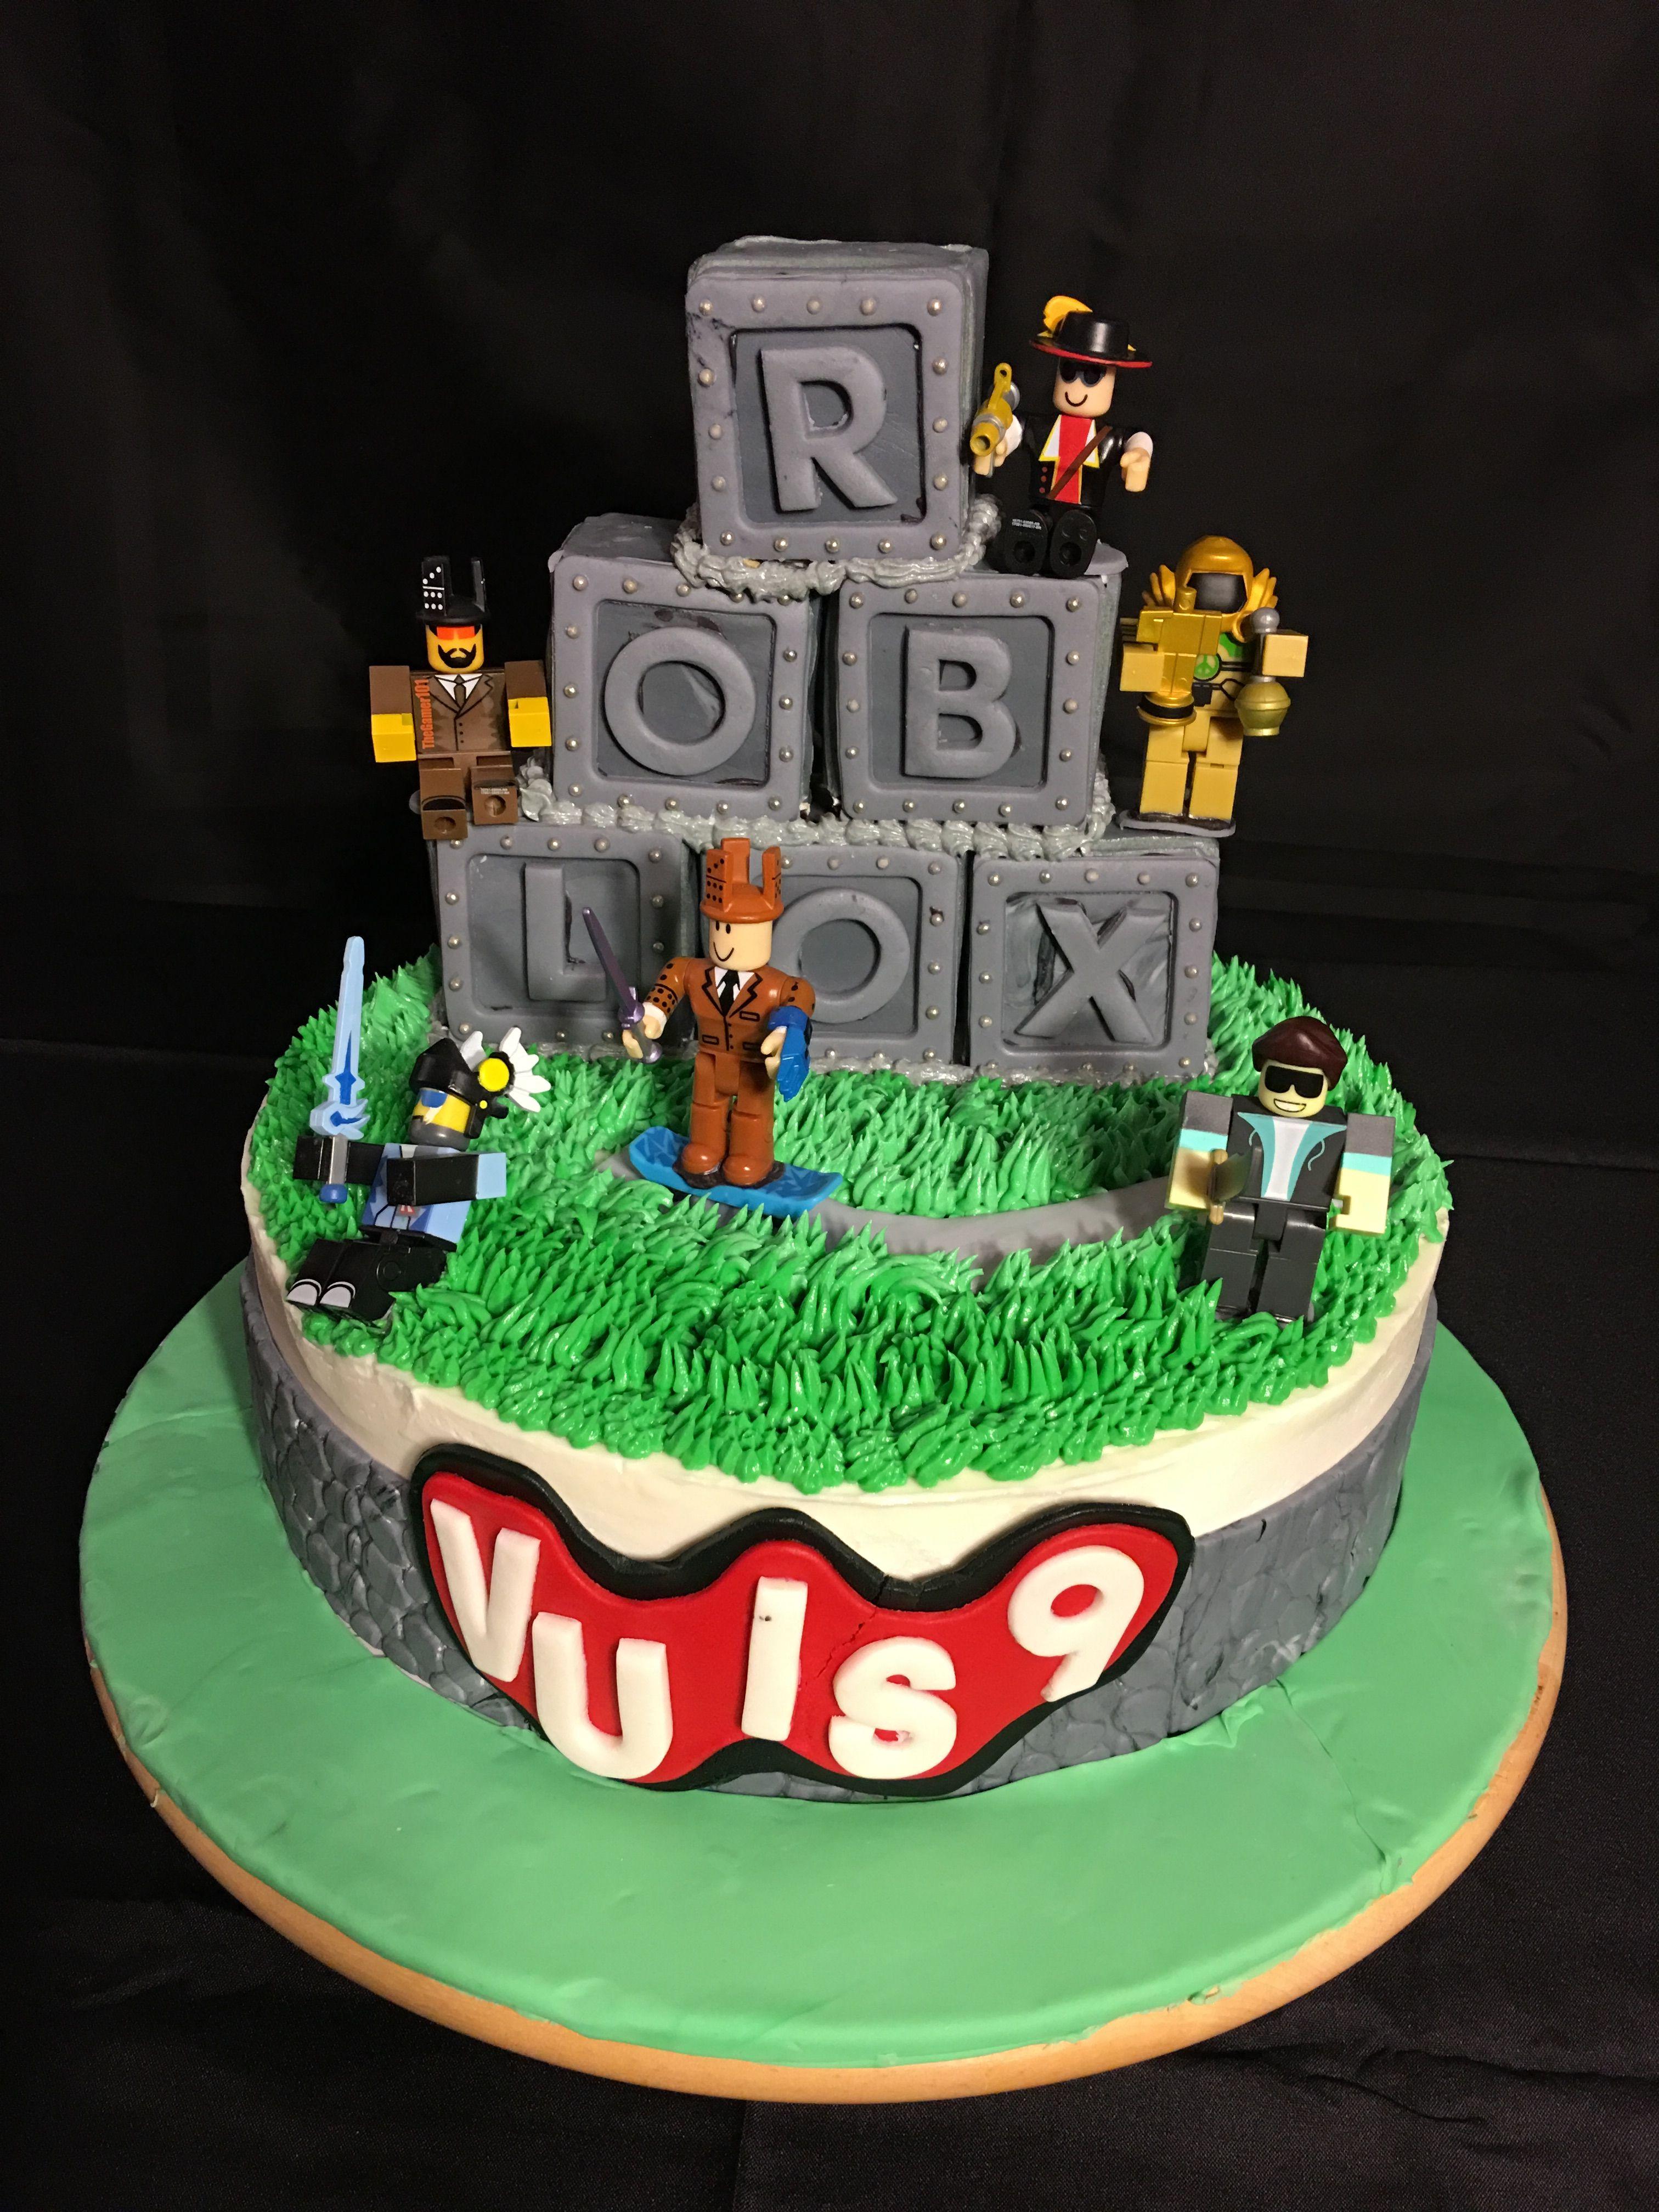 9th Birthday Cake Roblox Birthday Cake Fiesta De Cumpleanos